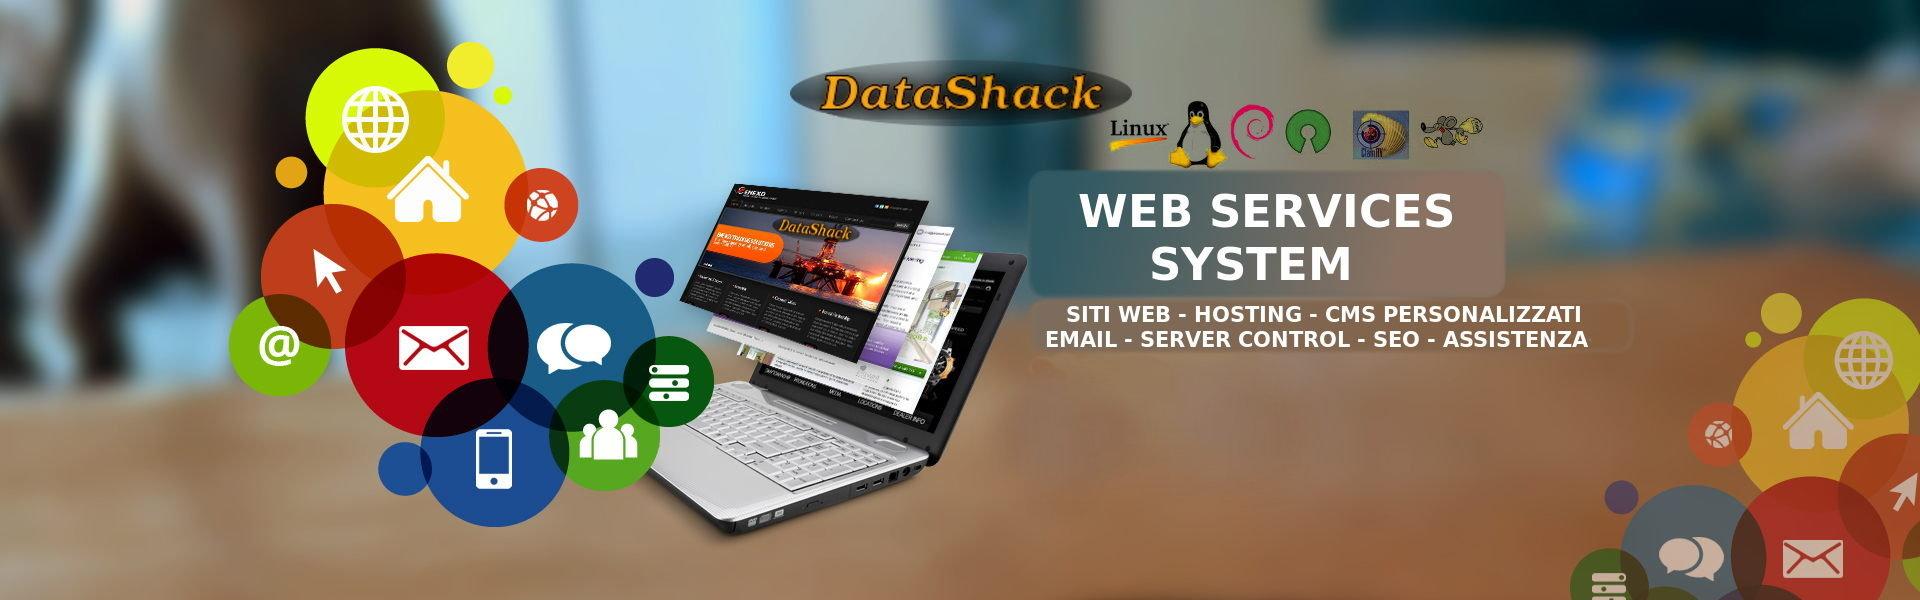 DataShack Internet Services,siti web, responsive, per dispositivi mobile, mail motori di ricerca